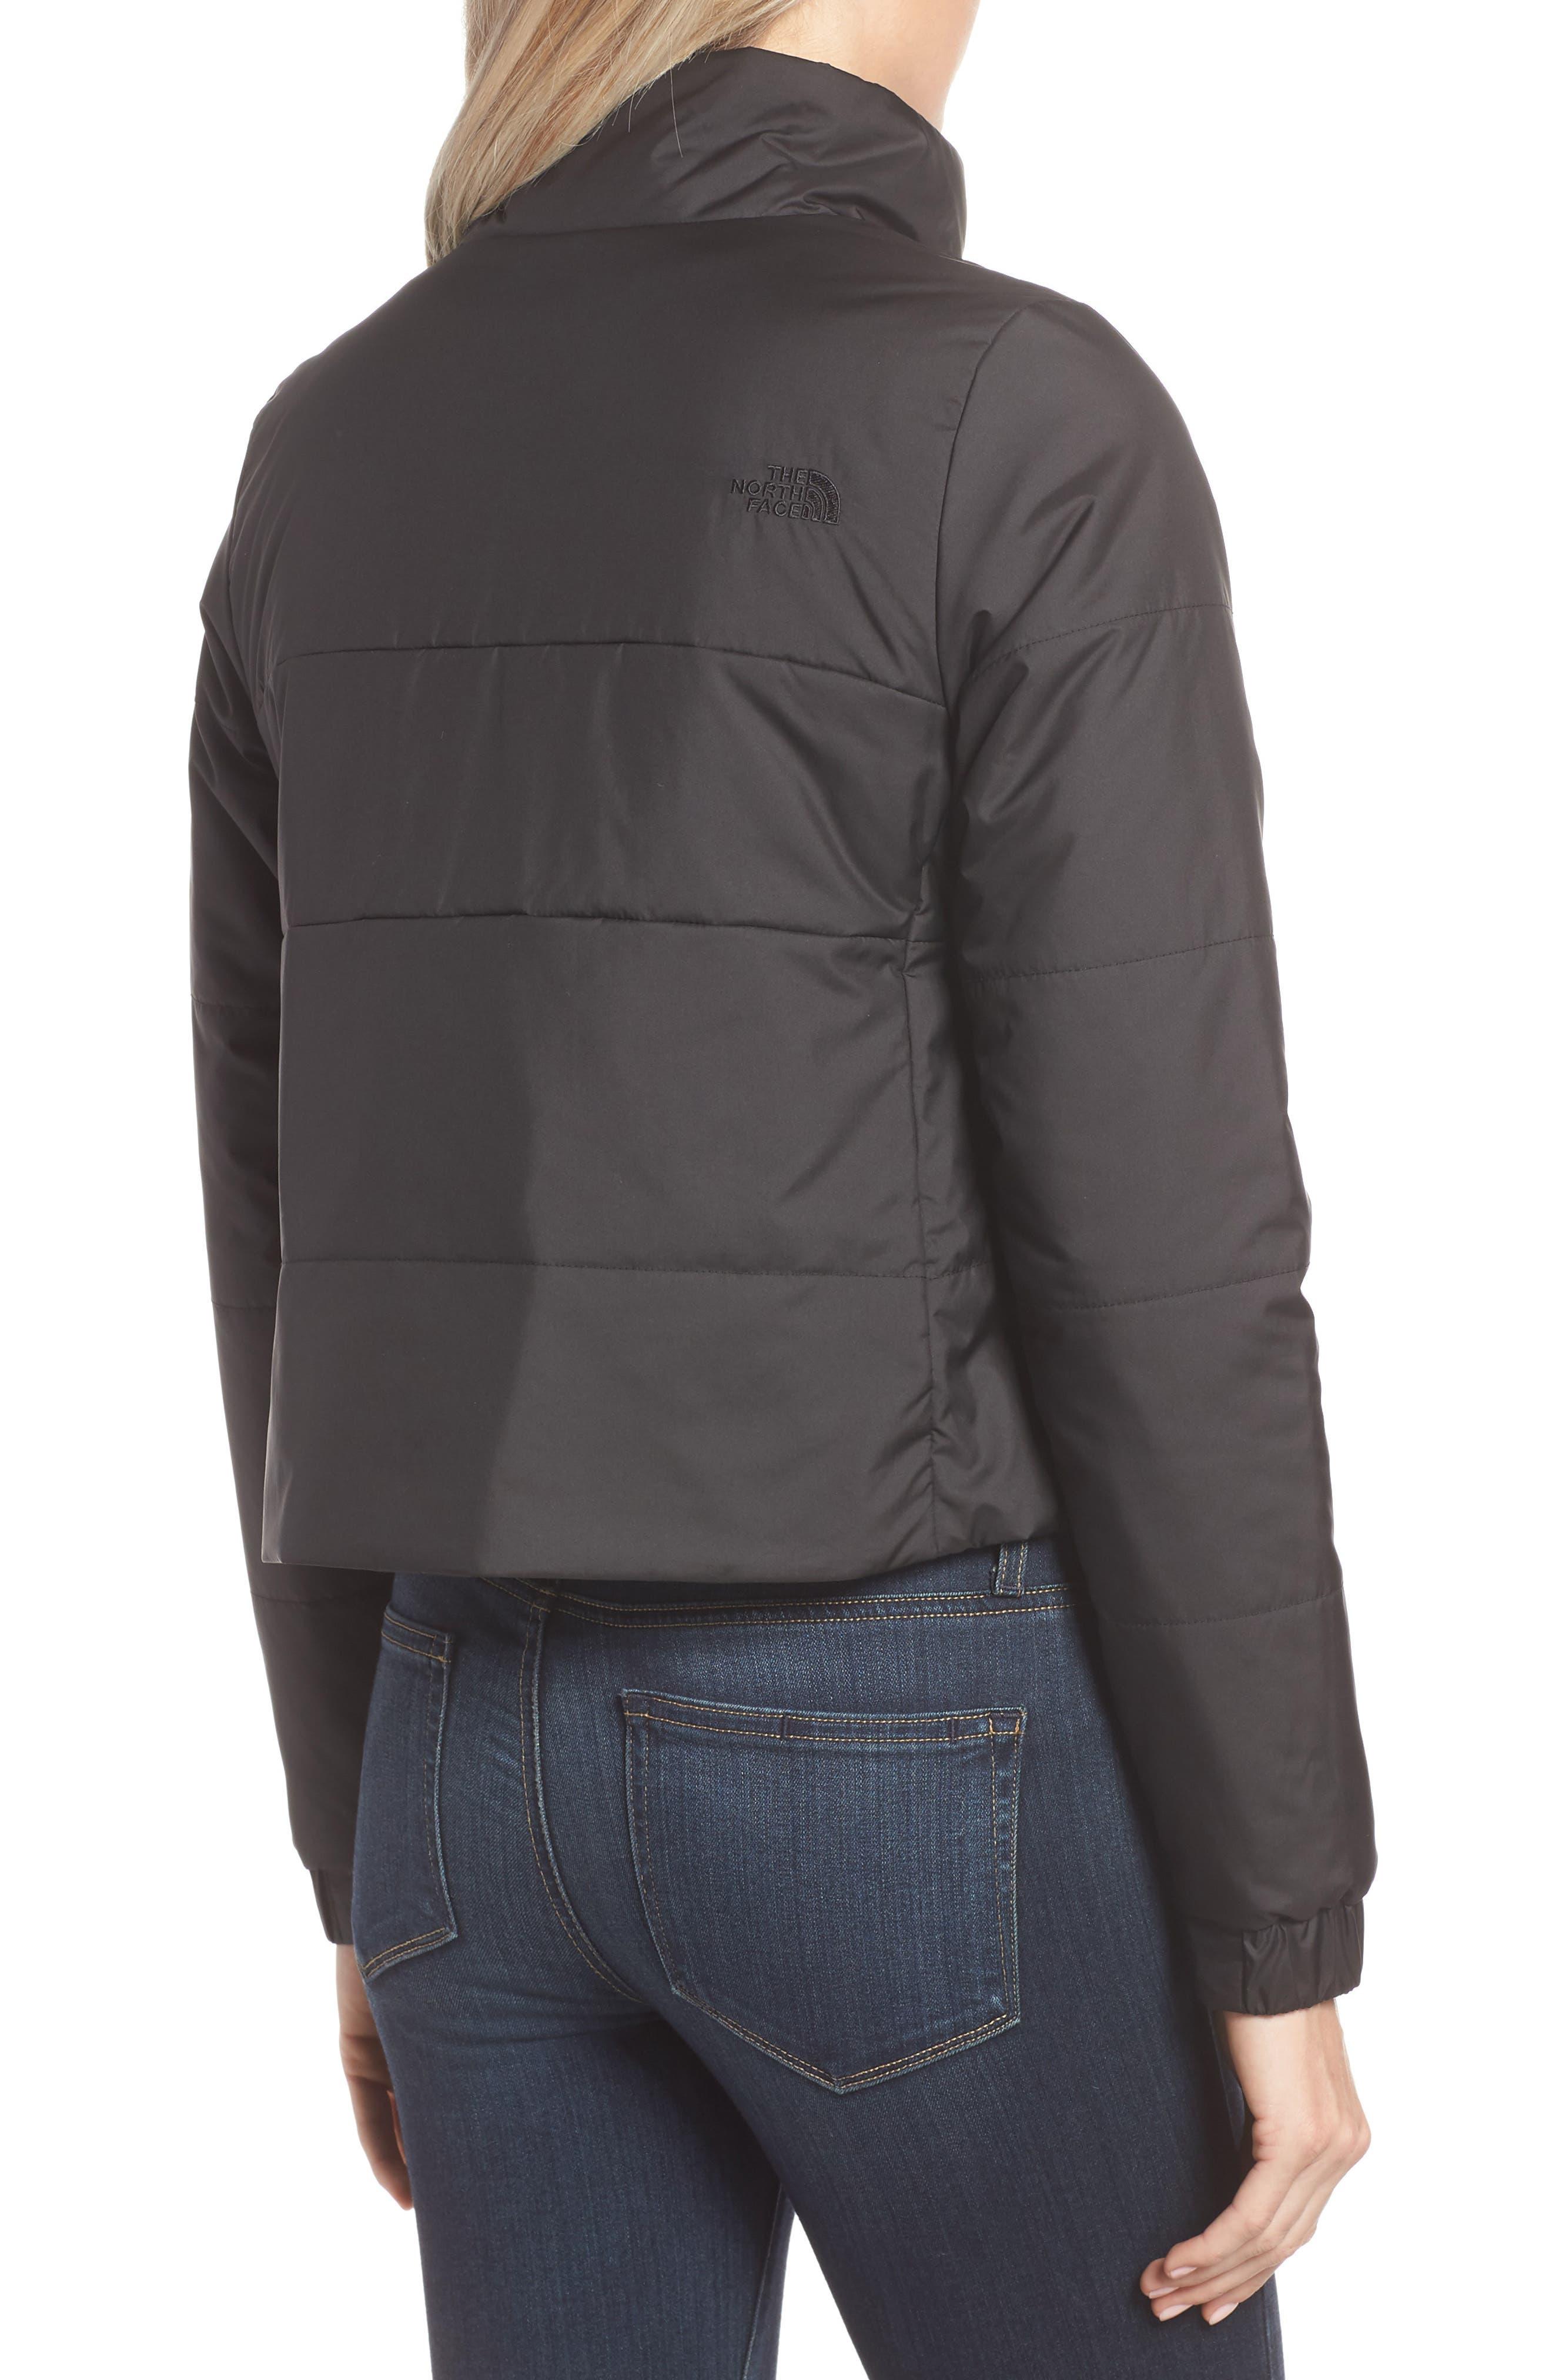 THE NORTH FACE,                             Femtastic Heatseeker Insulated Jacket,                             Alternate thumbnail 2, color,                             TNF BLACK